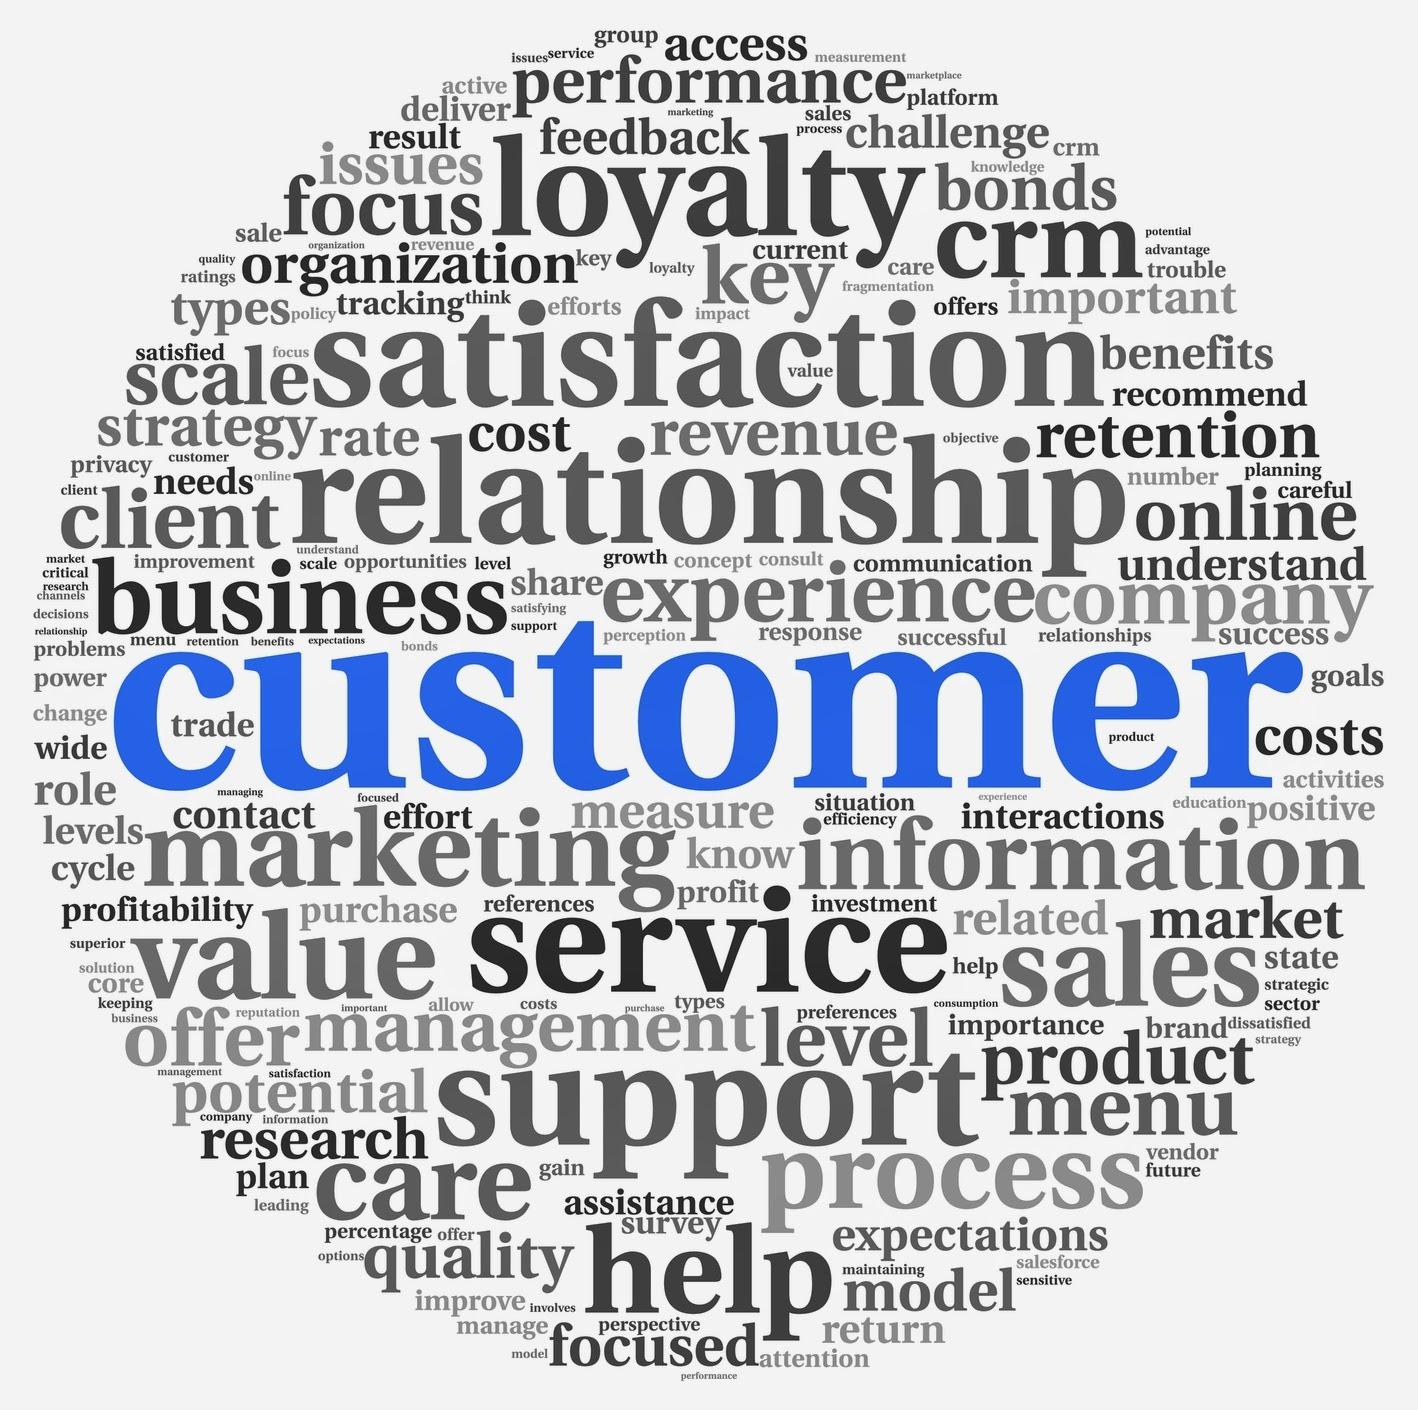 Provide Customer Support